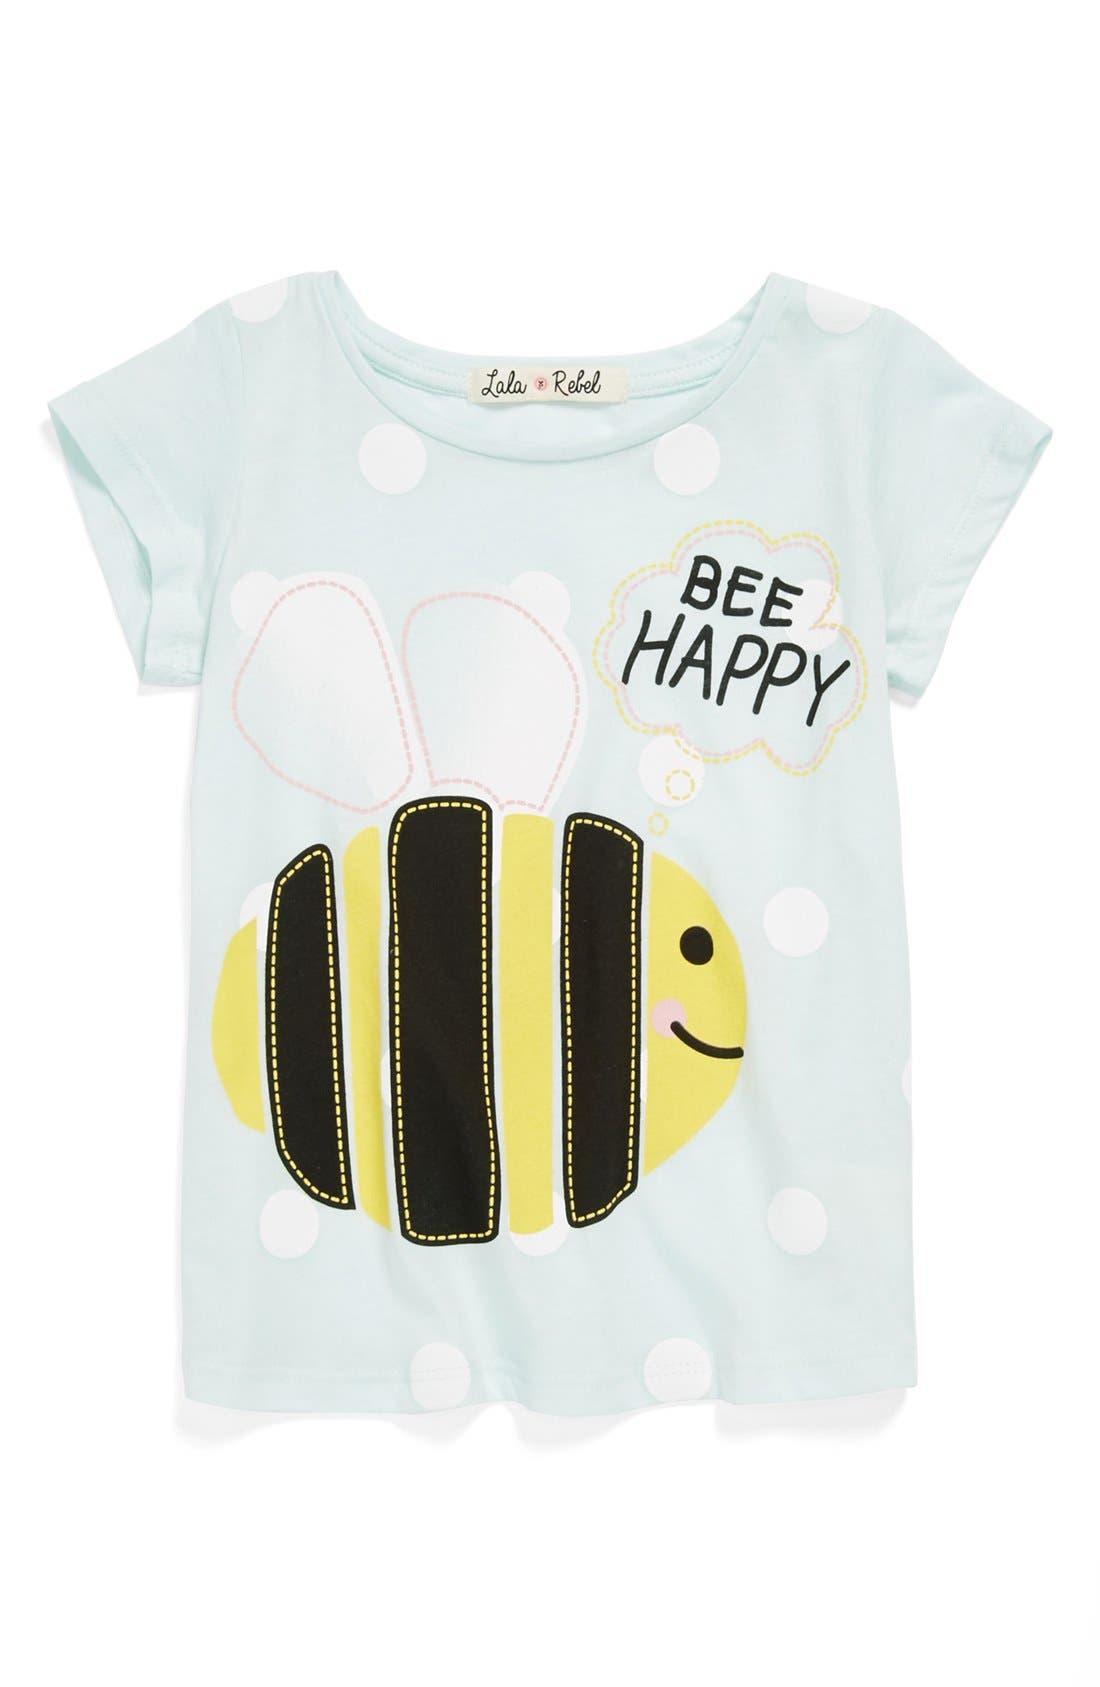 Alternate Image 1 Selected - Lala Rebel 'Bee Happy' Tee (Toddler Girls)